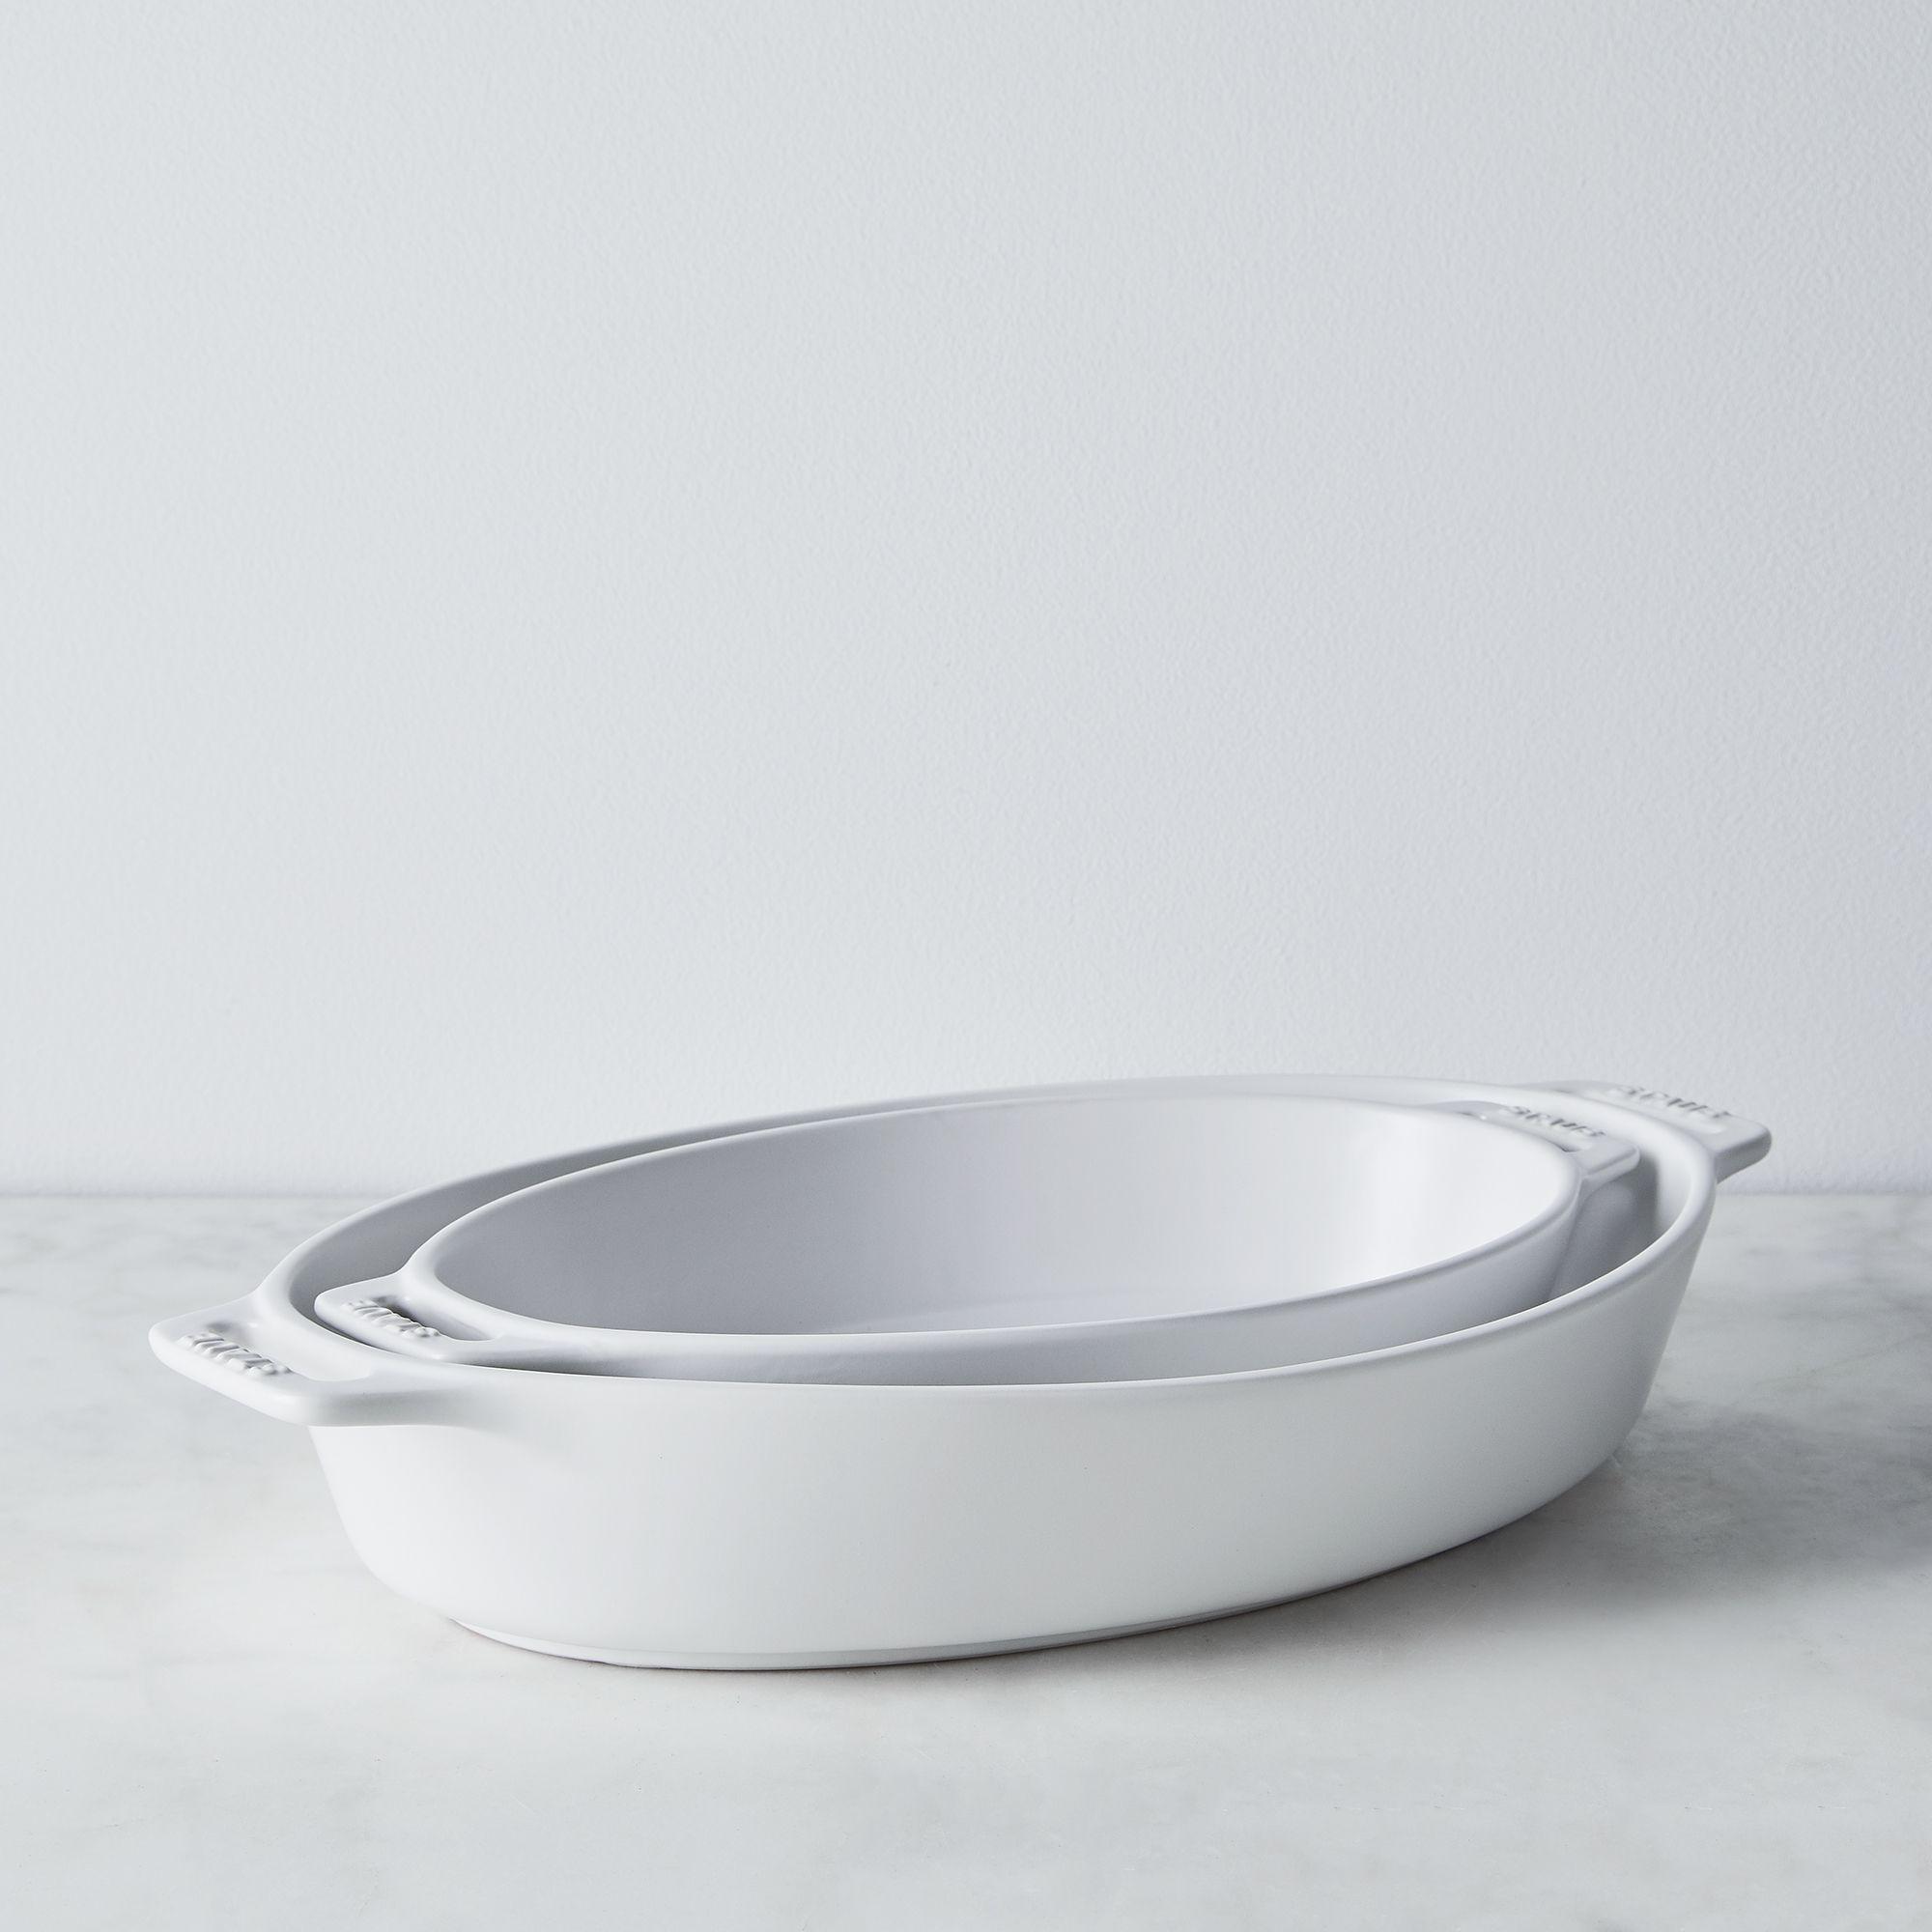 ZWILLING J.A. Henckels Staub Matte Ceramic Oval Baking Dish - Matte White, Set of 2